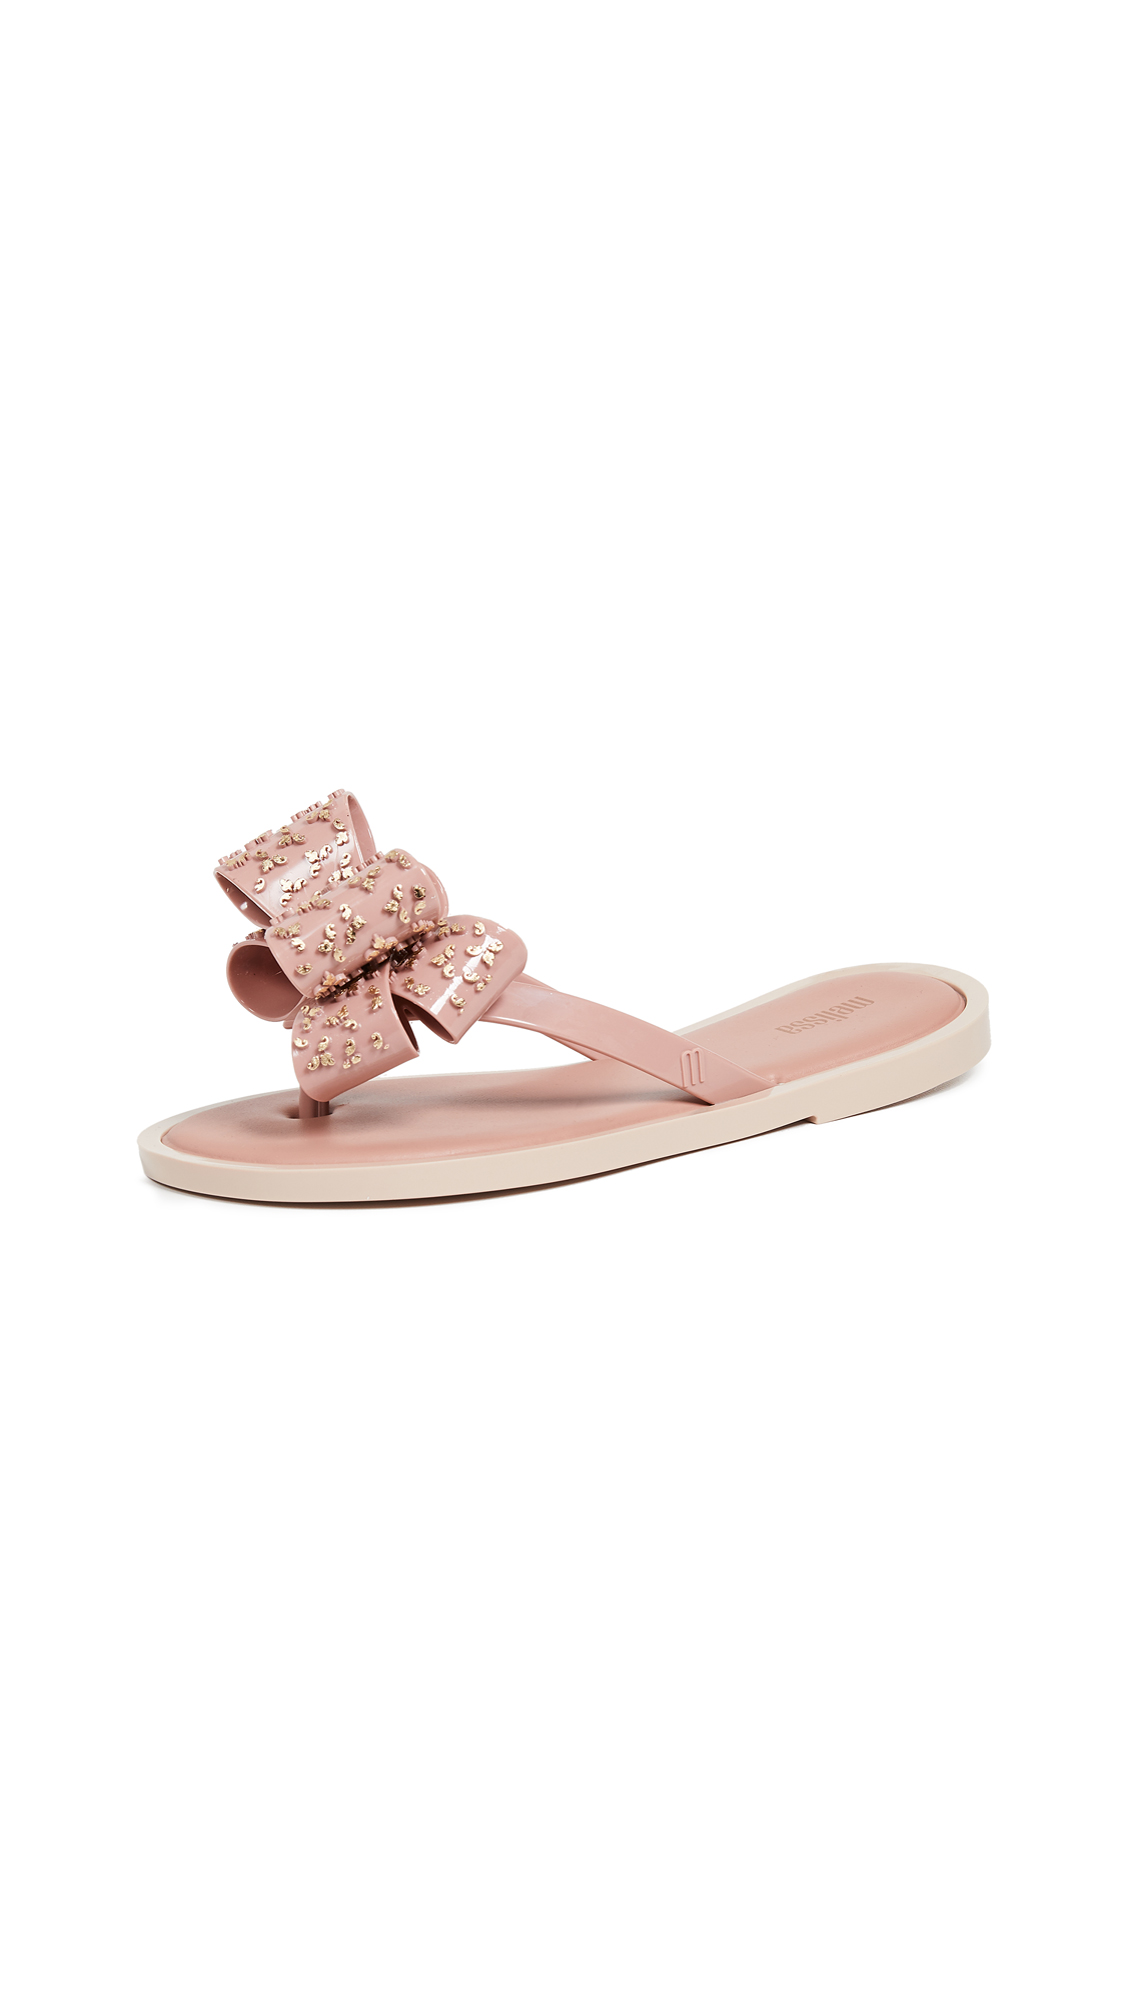 Melissa Sweet Flip Flops - Pink